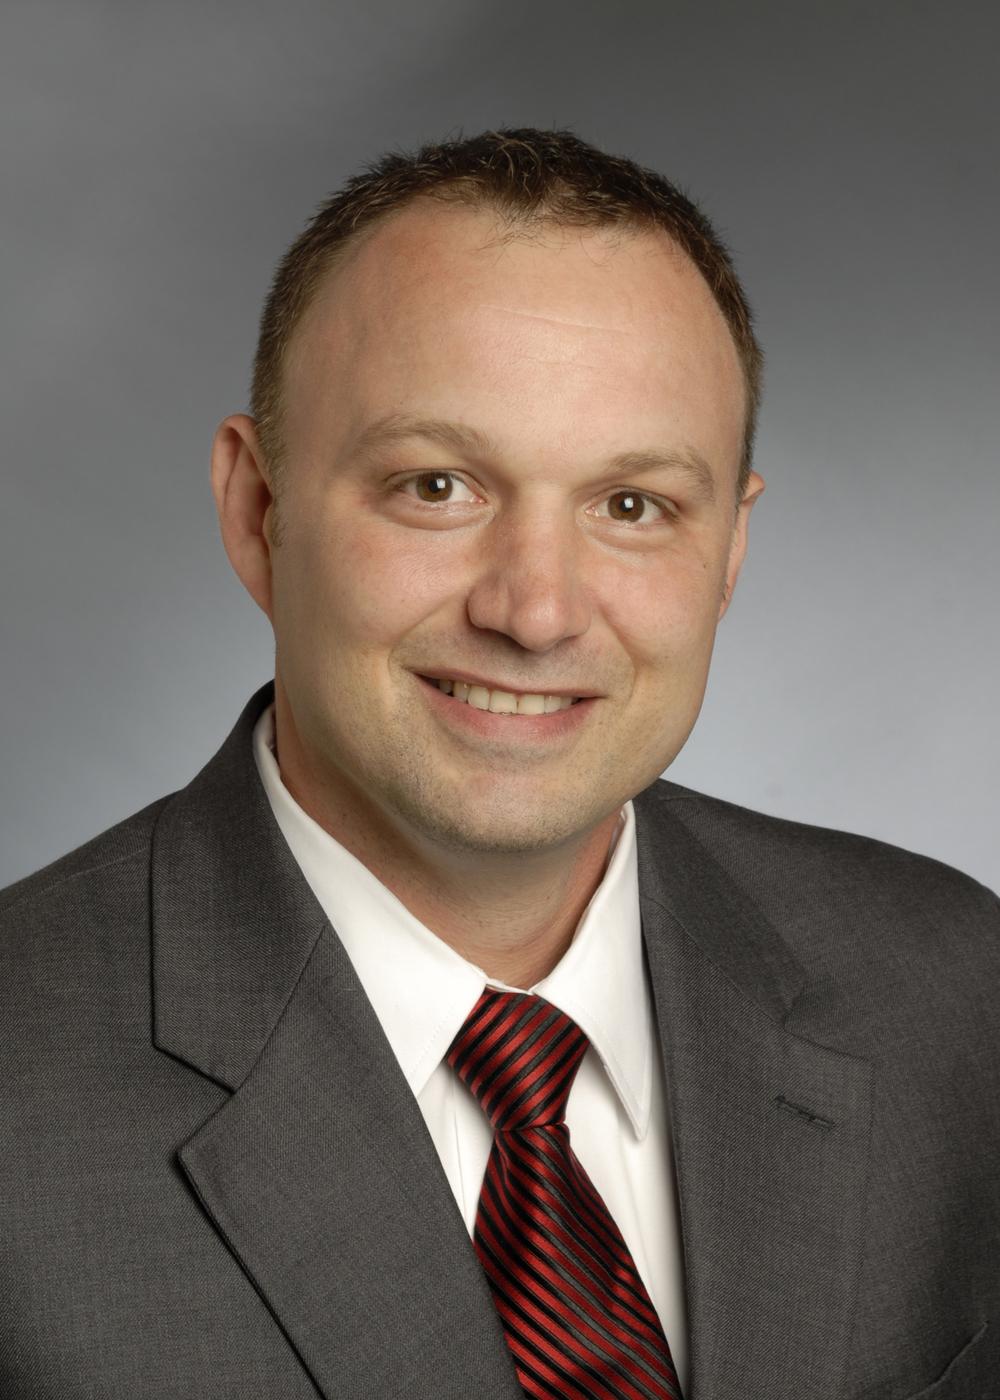 Legislator Justin F. Wilcox